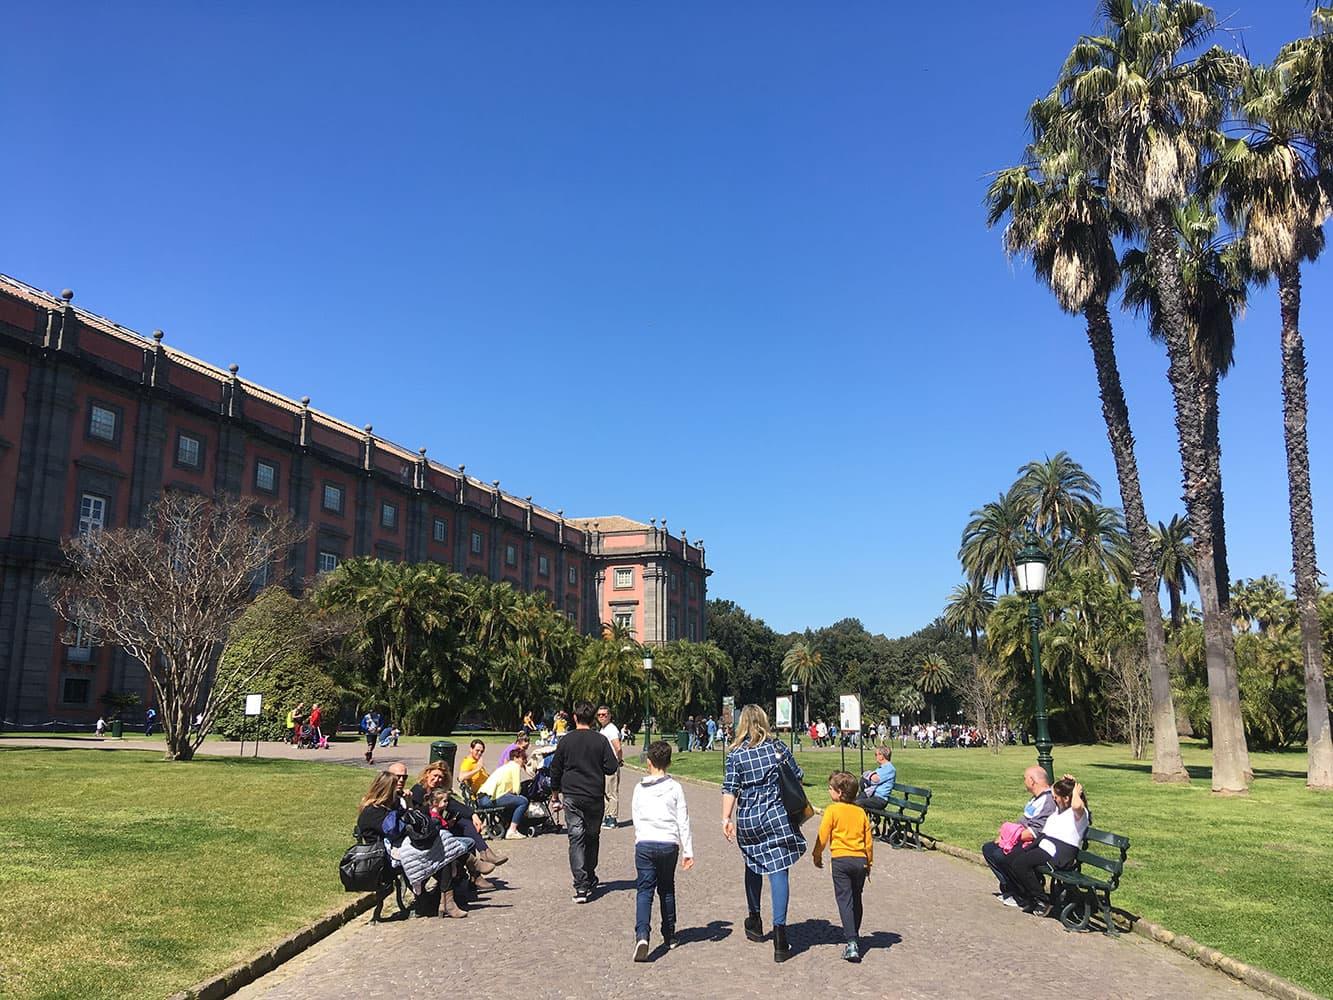 Walking up to Capodimonte Museum